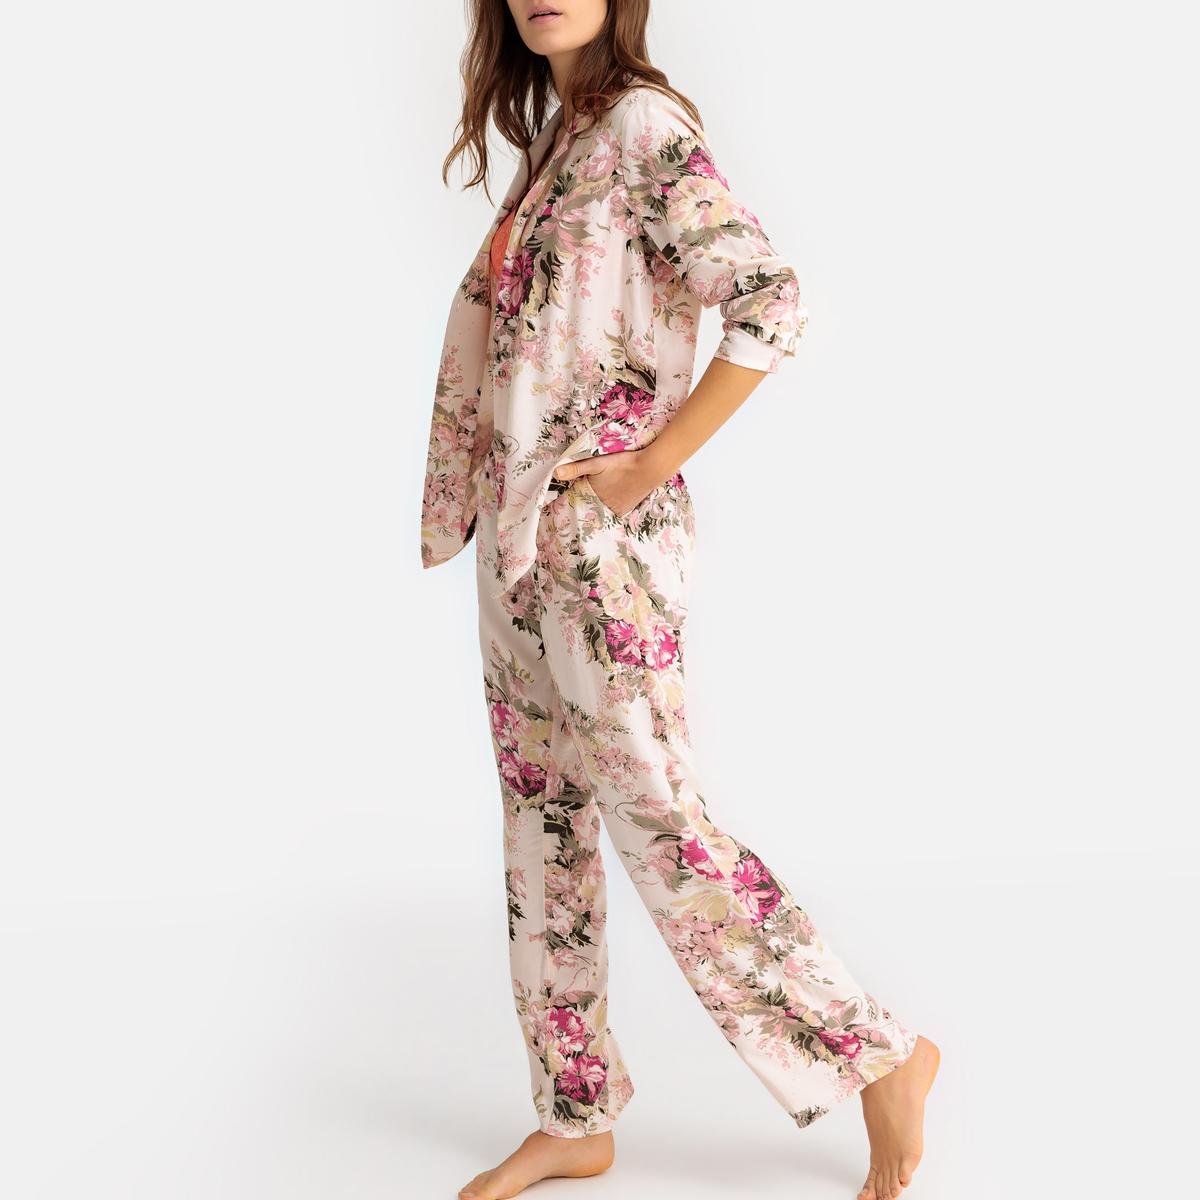 Pijama camisero de manga larga con estampado de flores